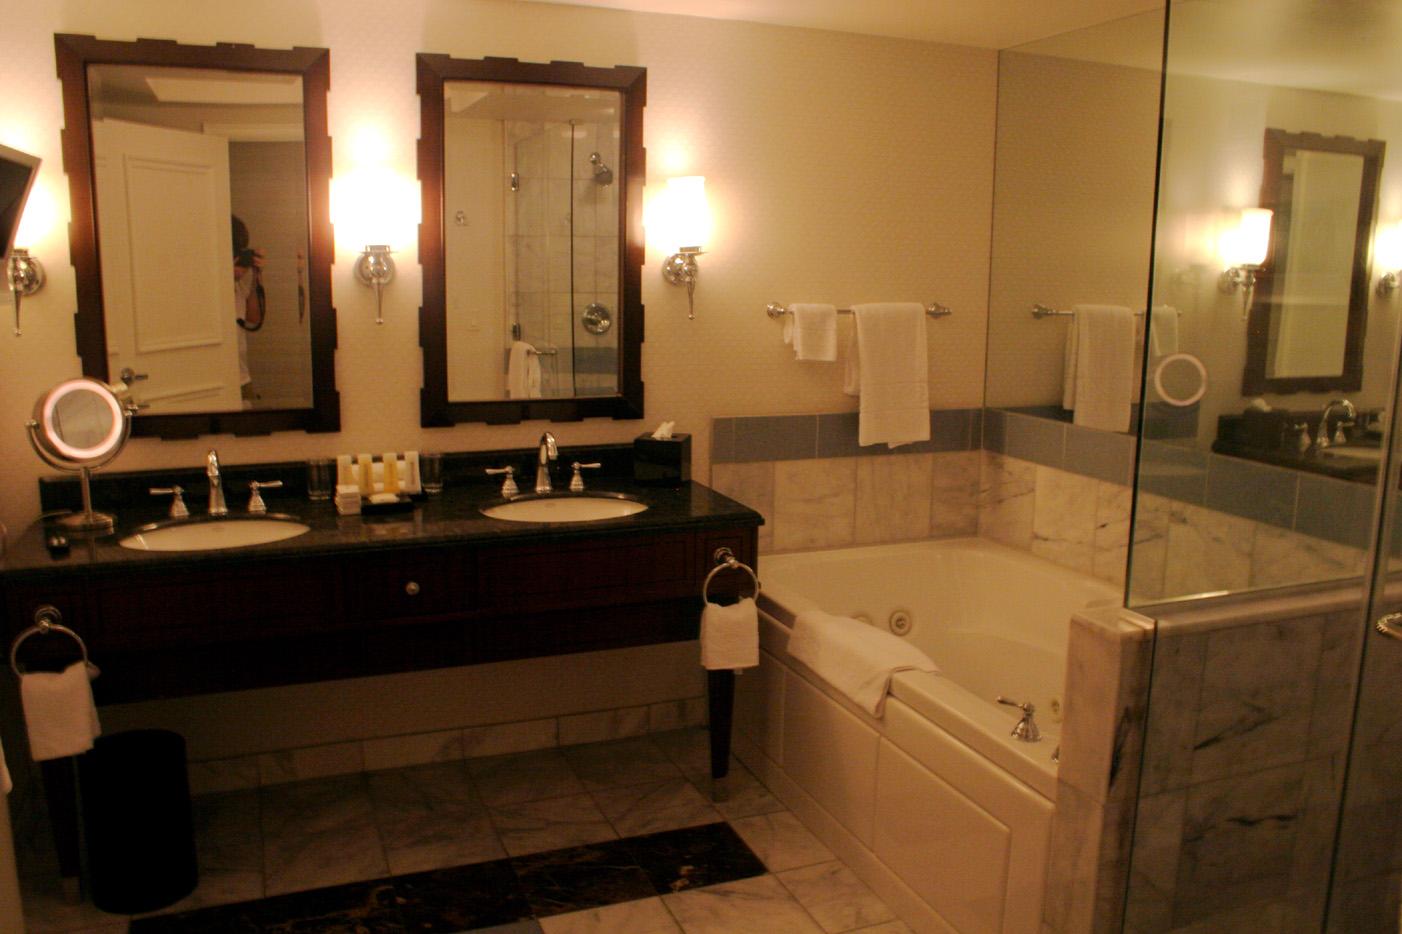 Atlantic City Hotel Rooms Caesars Palace Augustus Tower